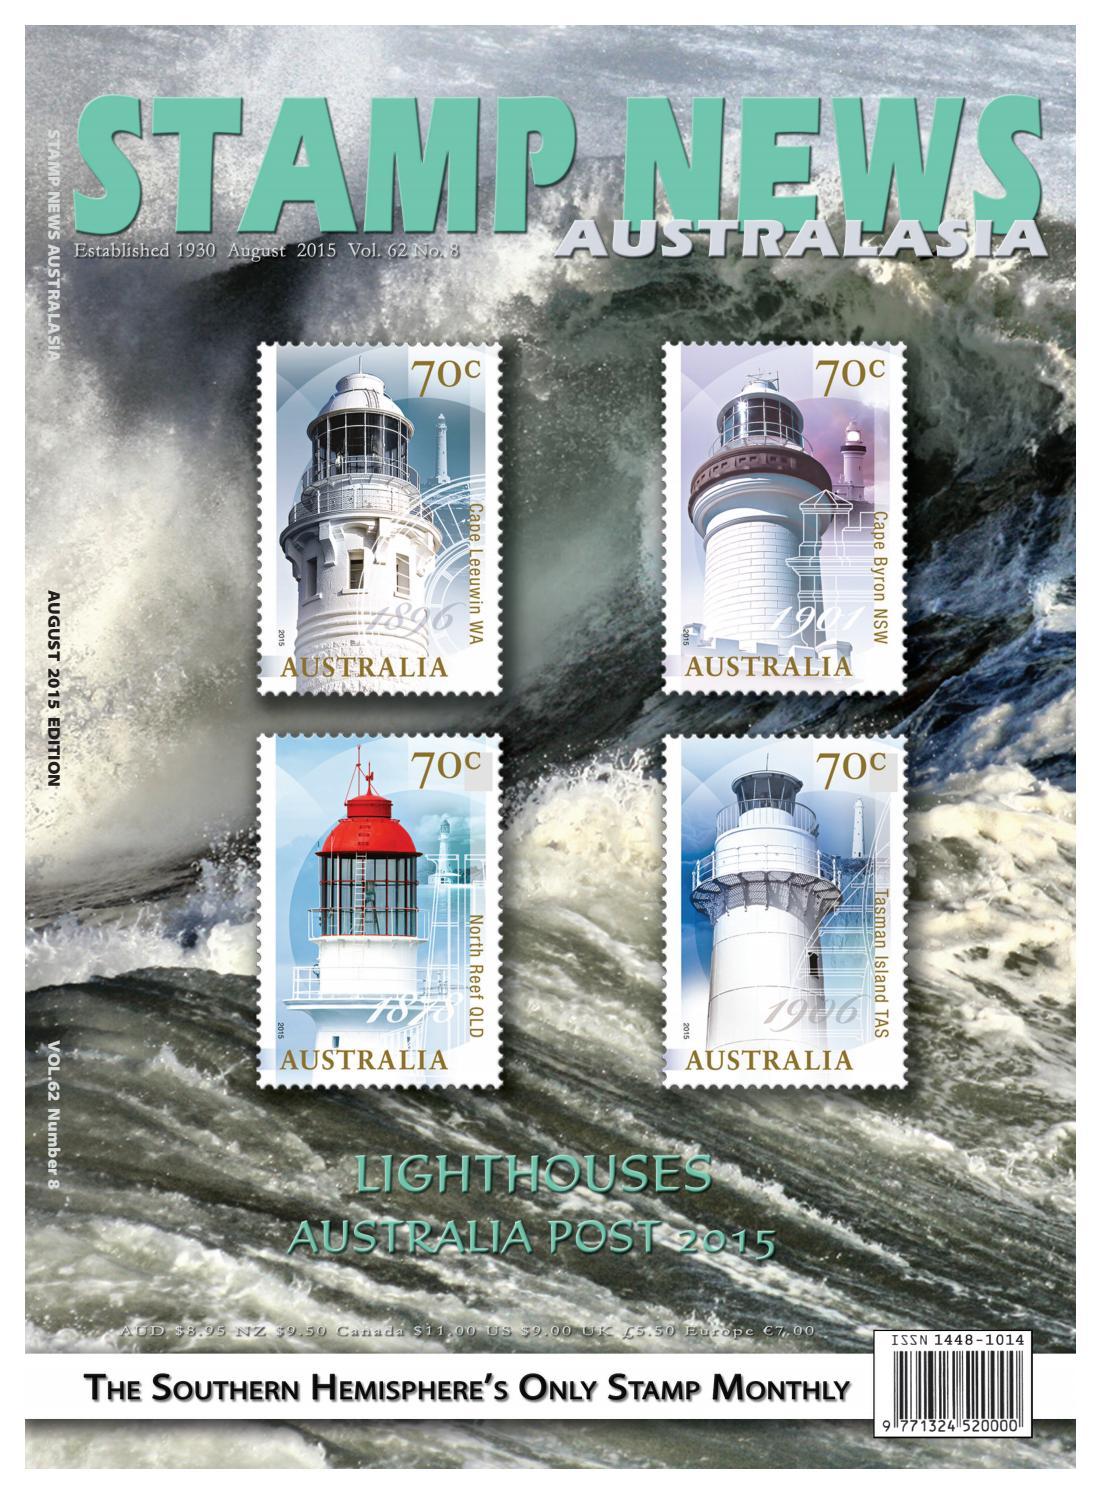 february 2015 tuvalu home.htm stamp news australasia august 2015 by stamp news australasia issuu  stamp news australasia august 2015 by